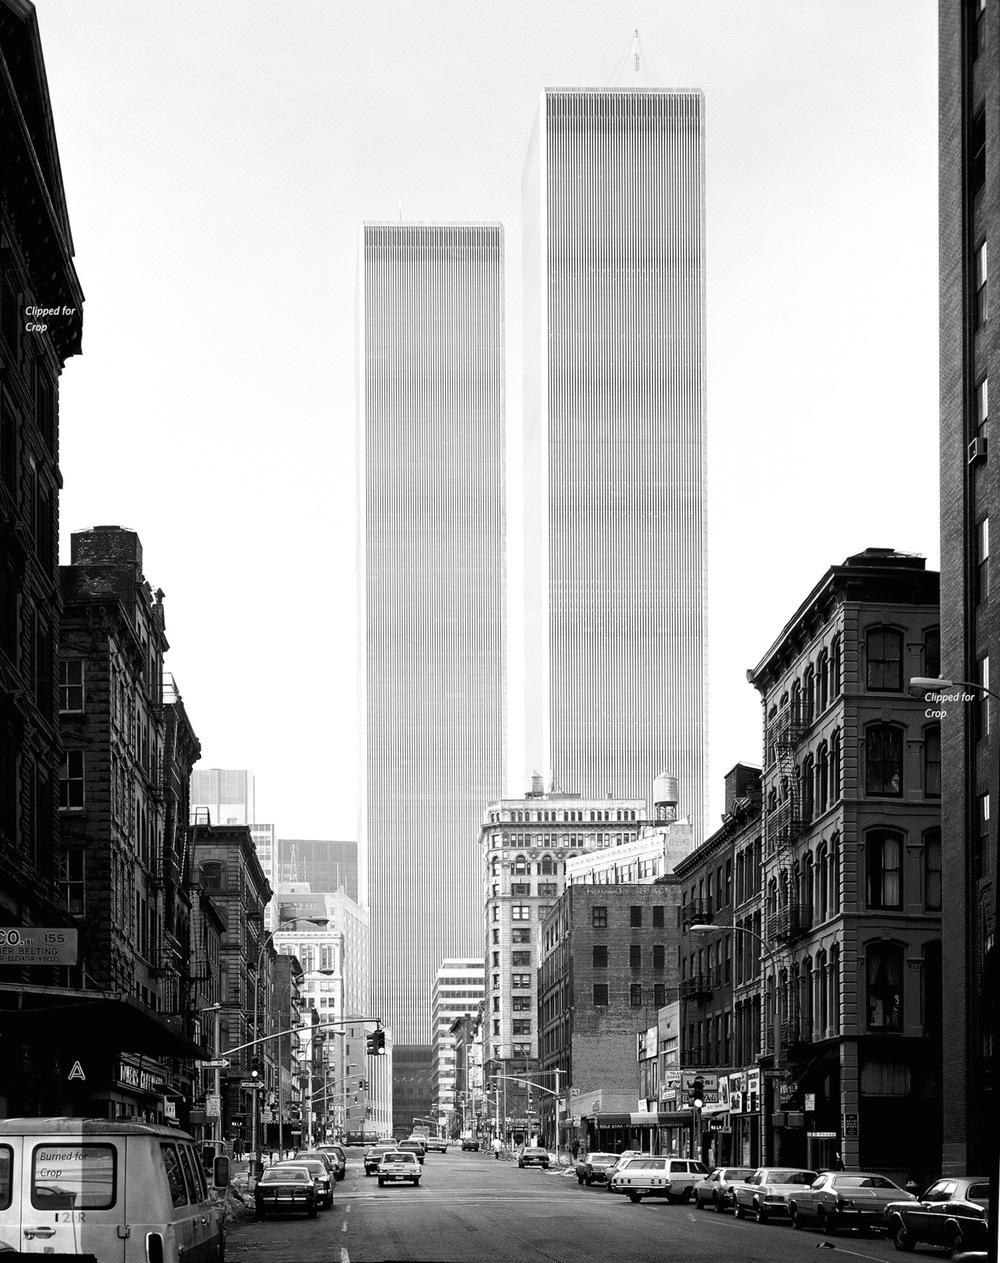 Minoru Yamasaki, World Trade Center (New York, NY) 1978